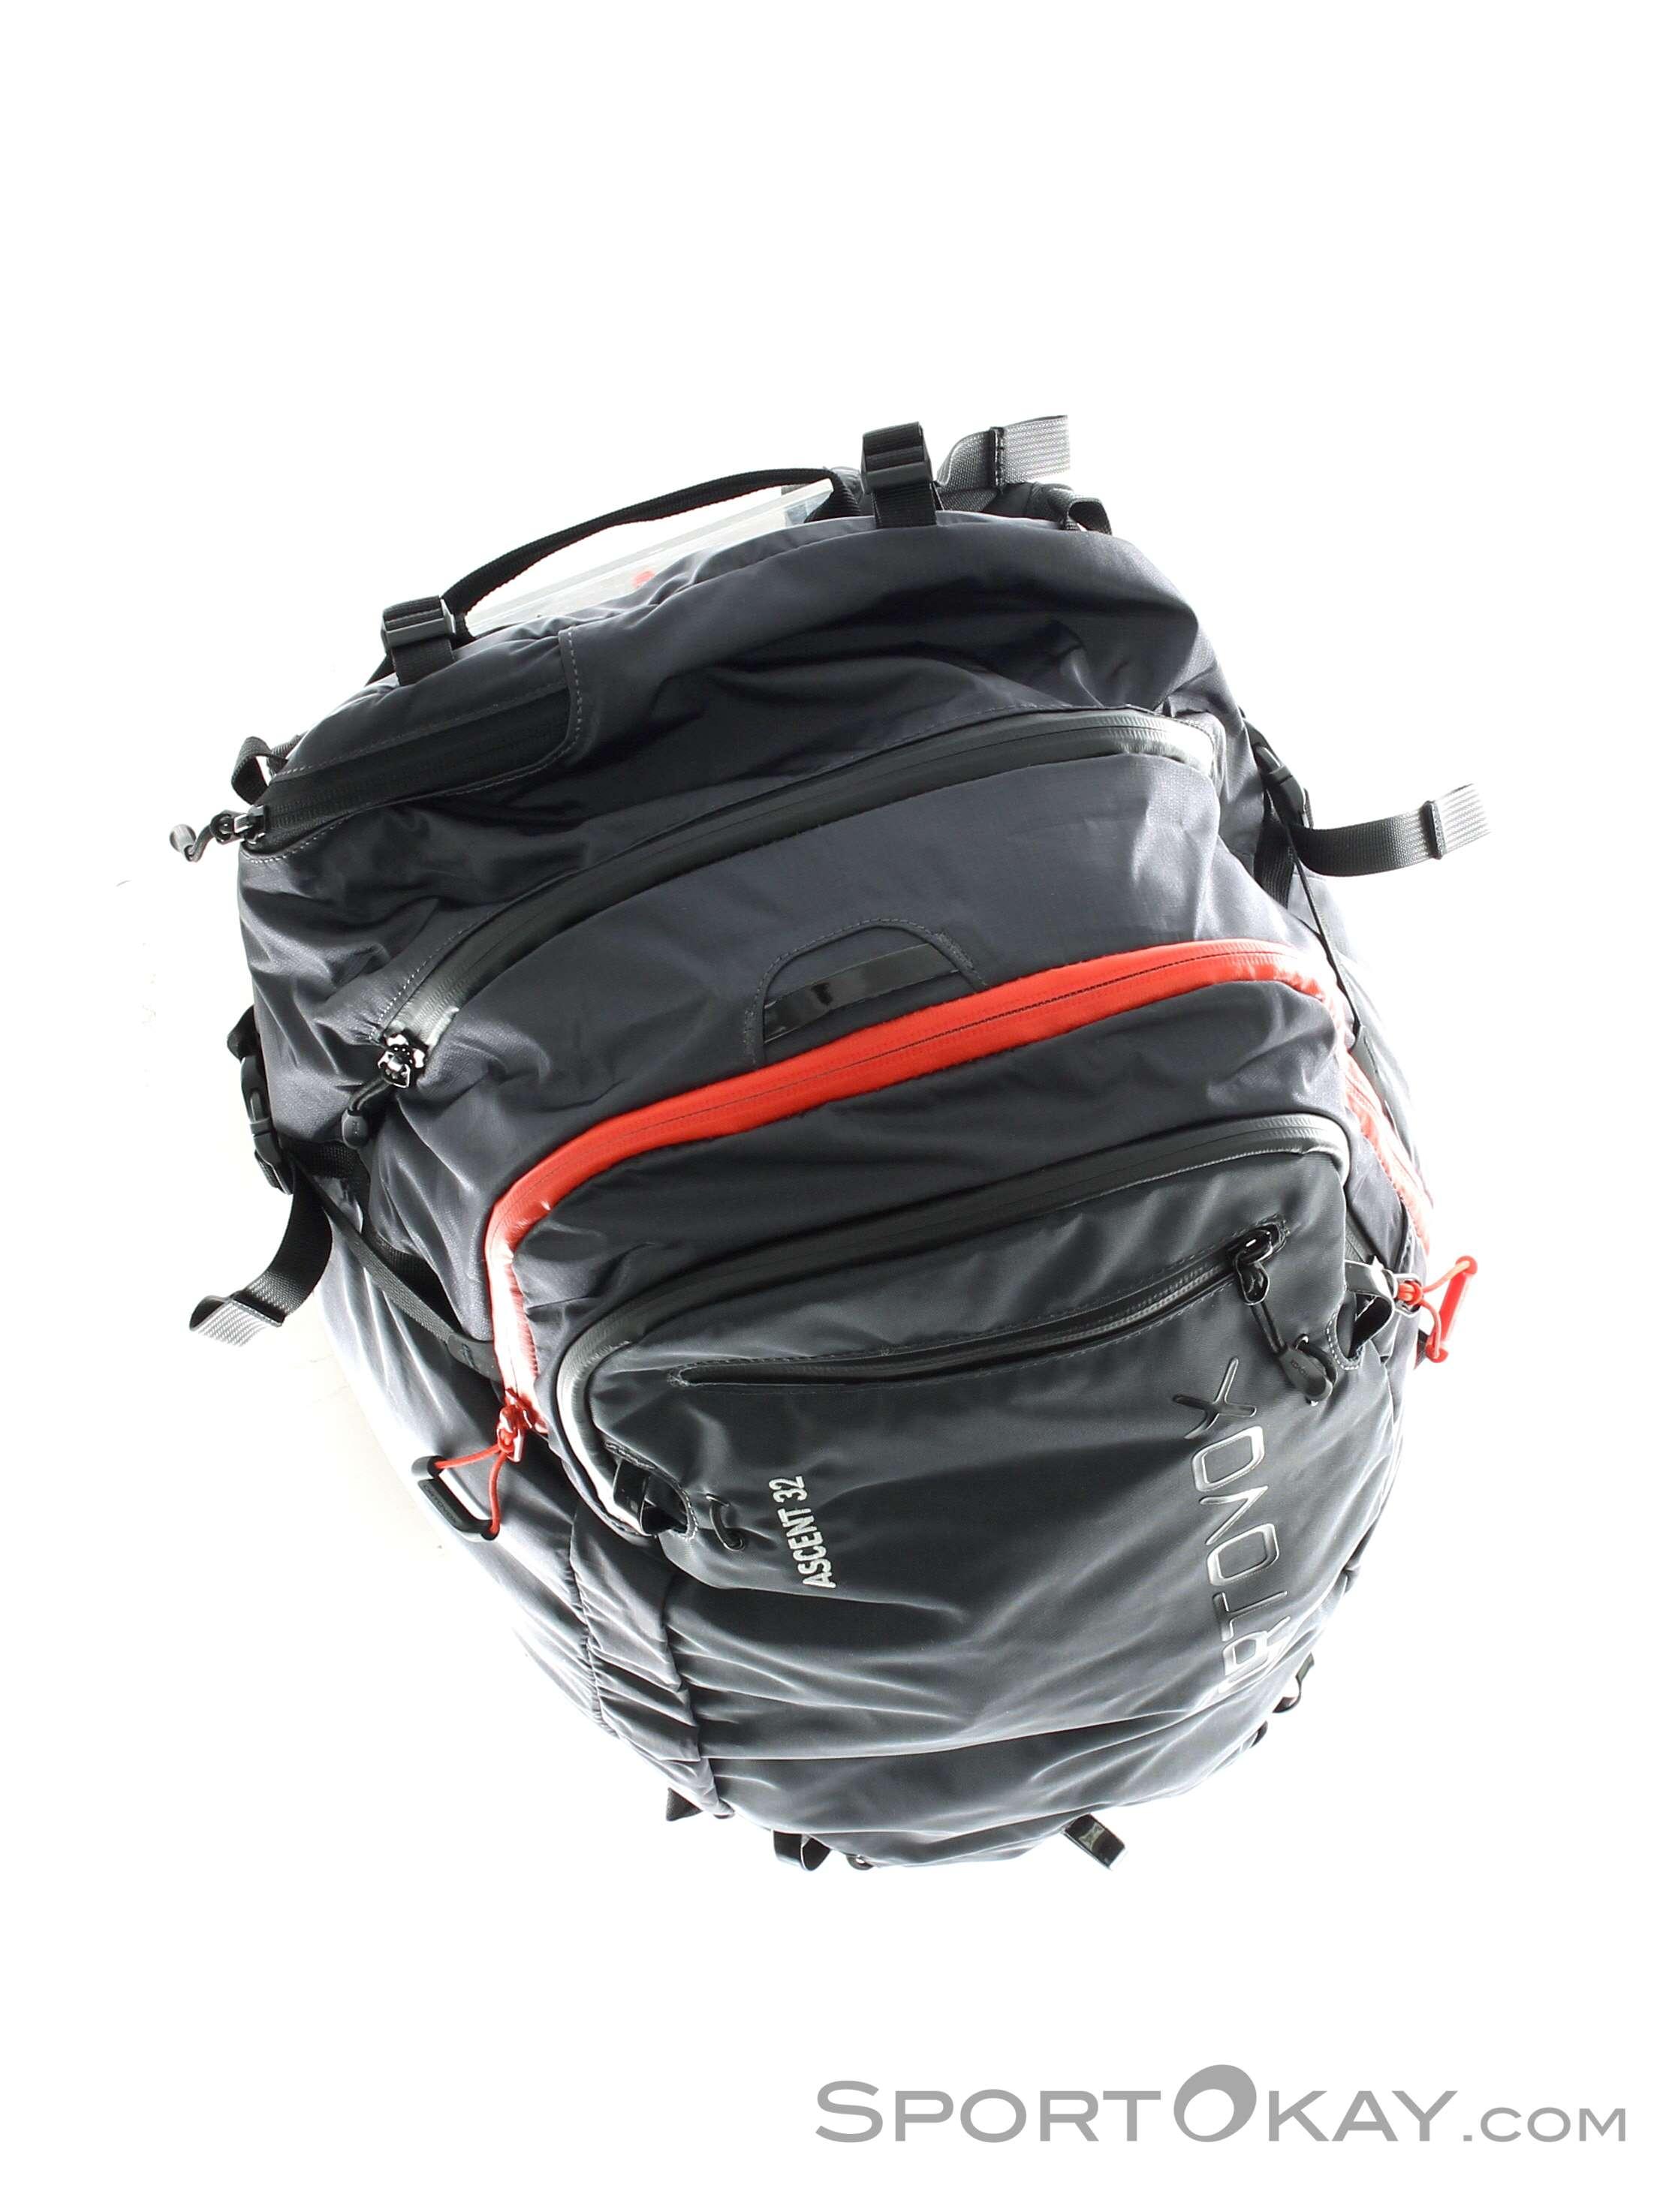 3edc0655bc6a Ortovox Ascent 32l Ski Touring Backpack - Backpacks - Backpacks ...